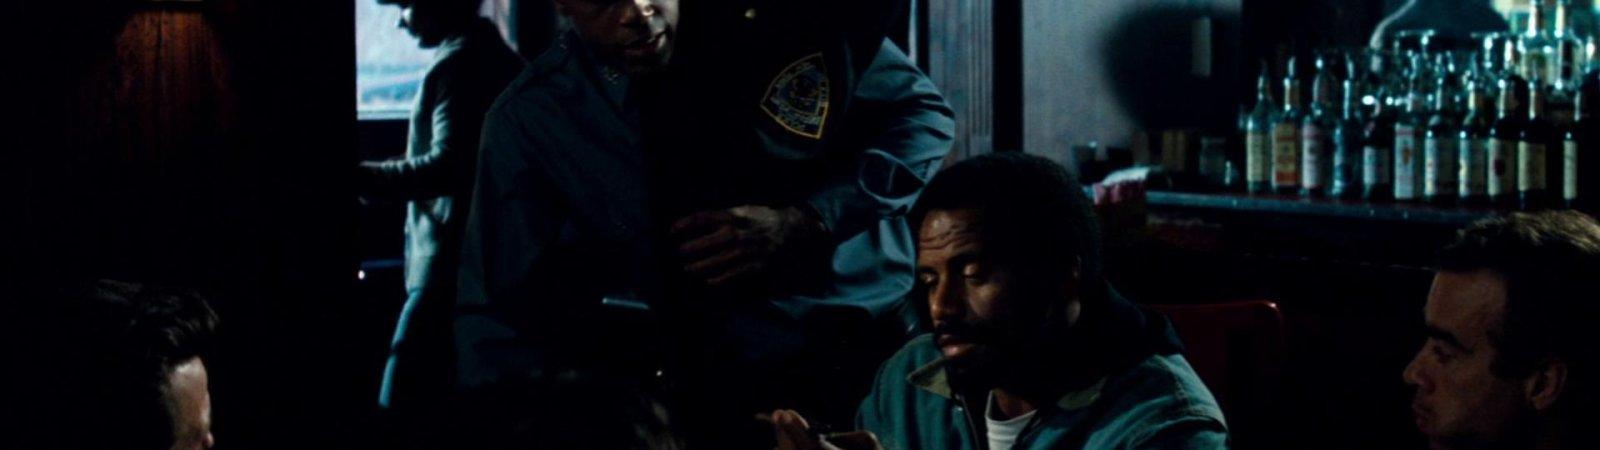 Photo du film : Vigilante